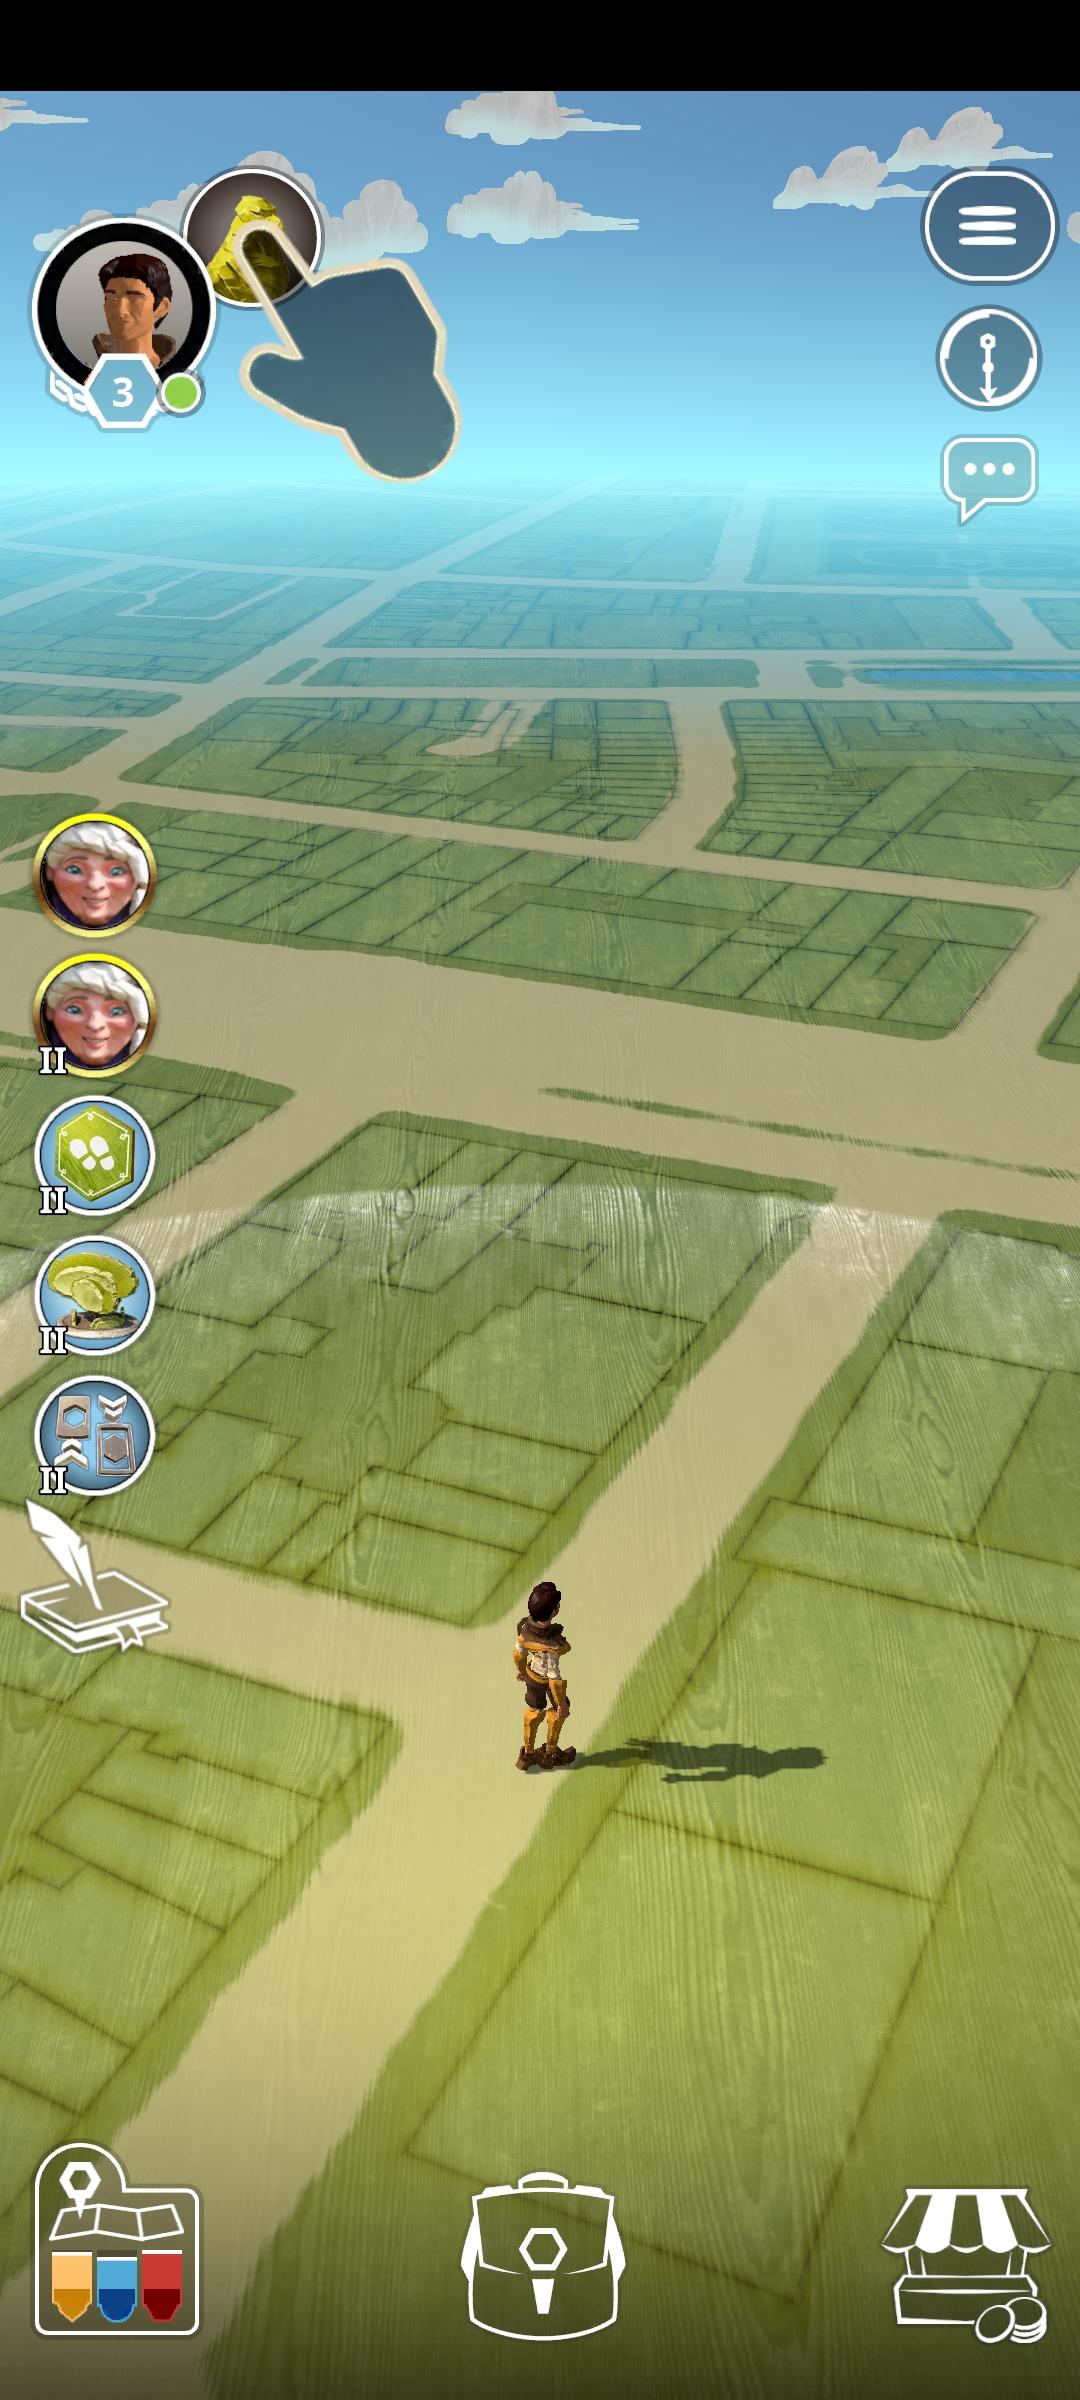 Screenshot_2021-03-17-09-53-48-012_com.nianticlabs.catanwe.jpg